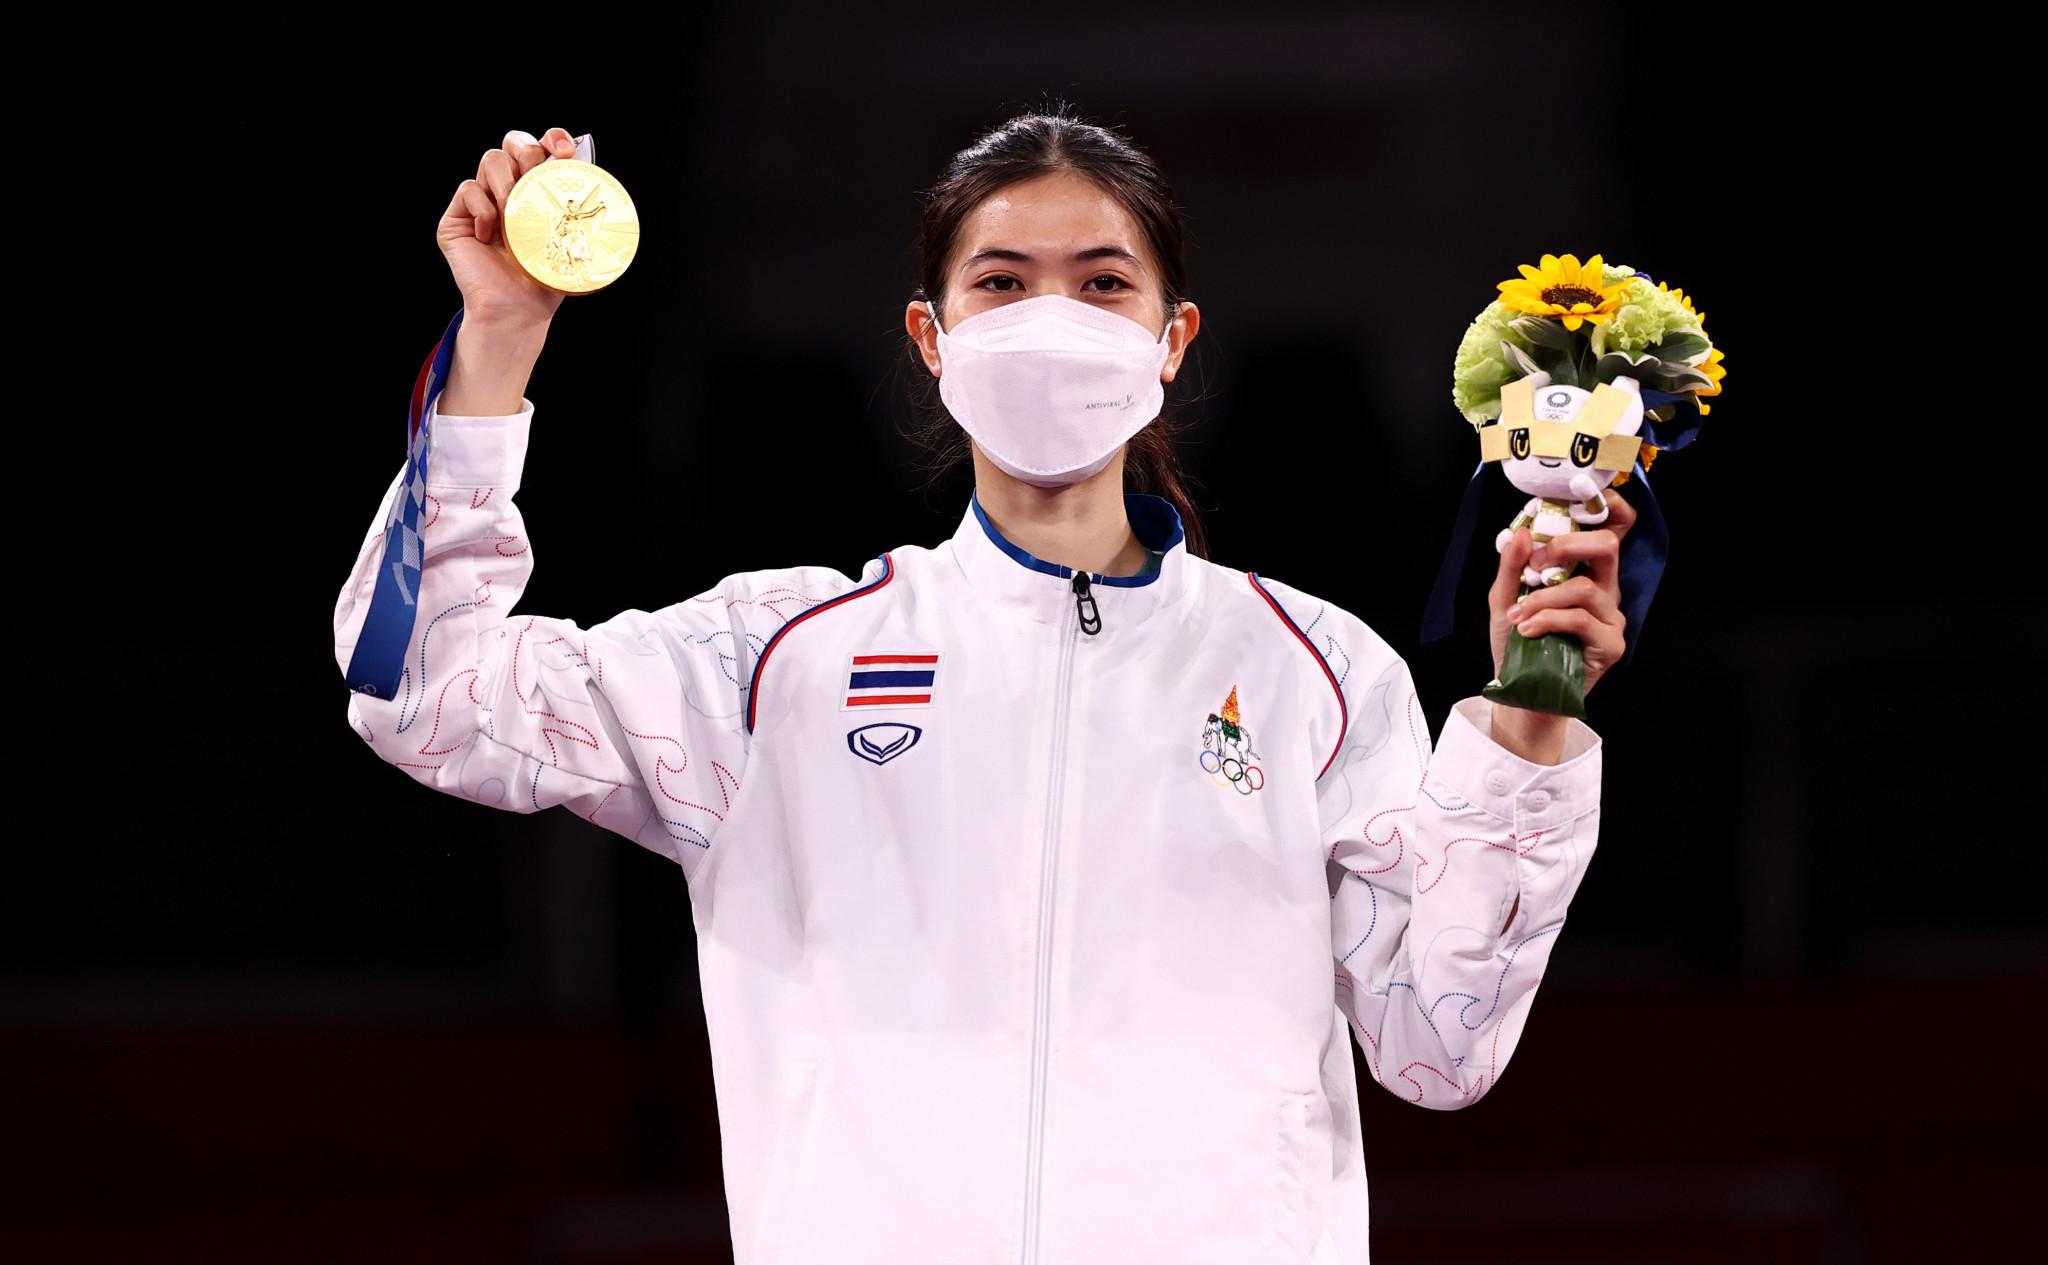 Olympic taekwondo gold medallist Wongpattanakit receives hero's reception in Thailand